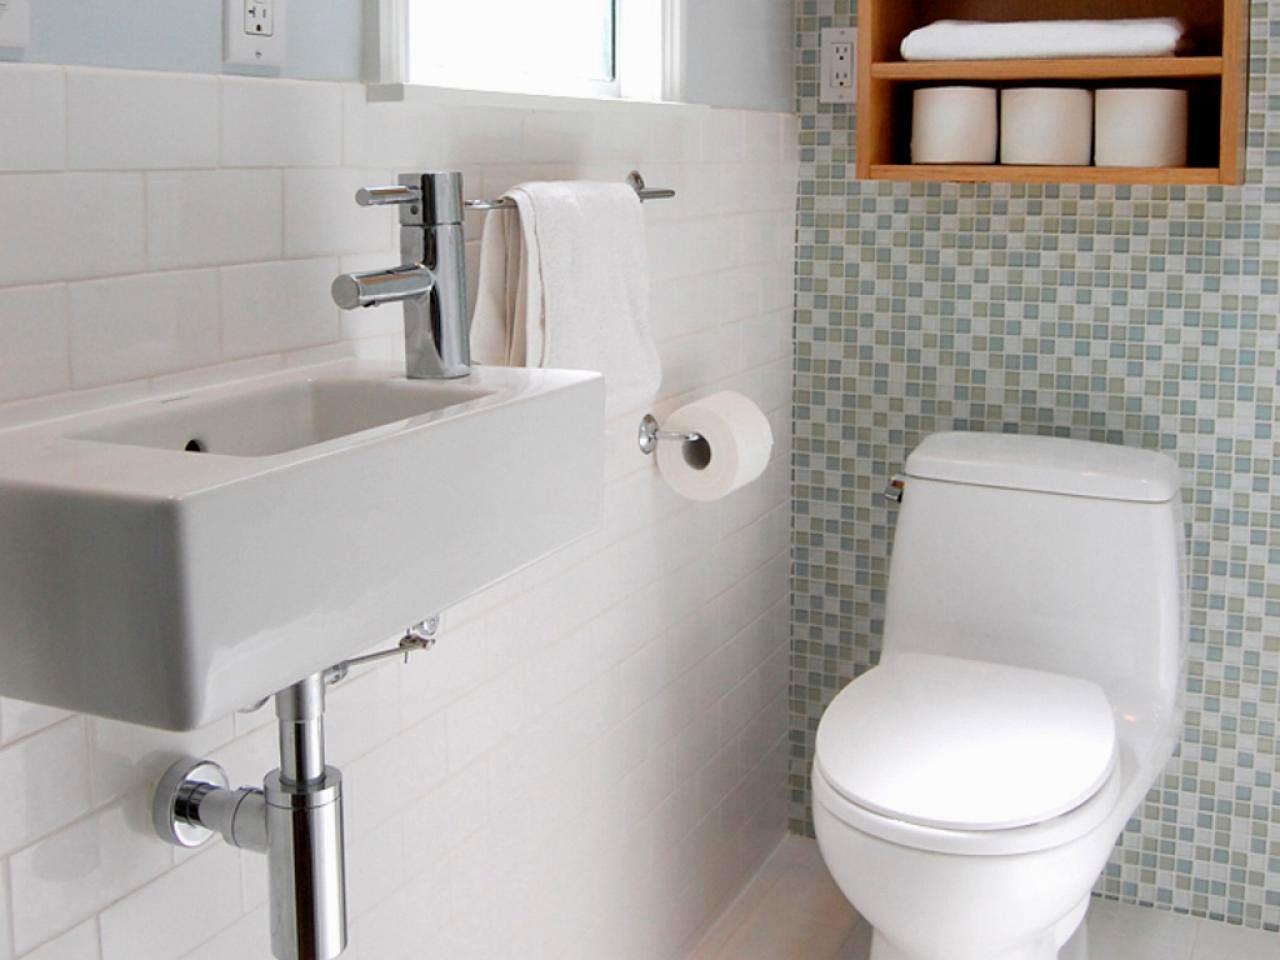 new ikea bathroom sink collection-Excellent Ikea Bathroom Sink Decoration